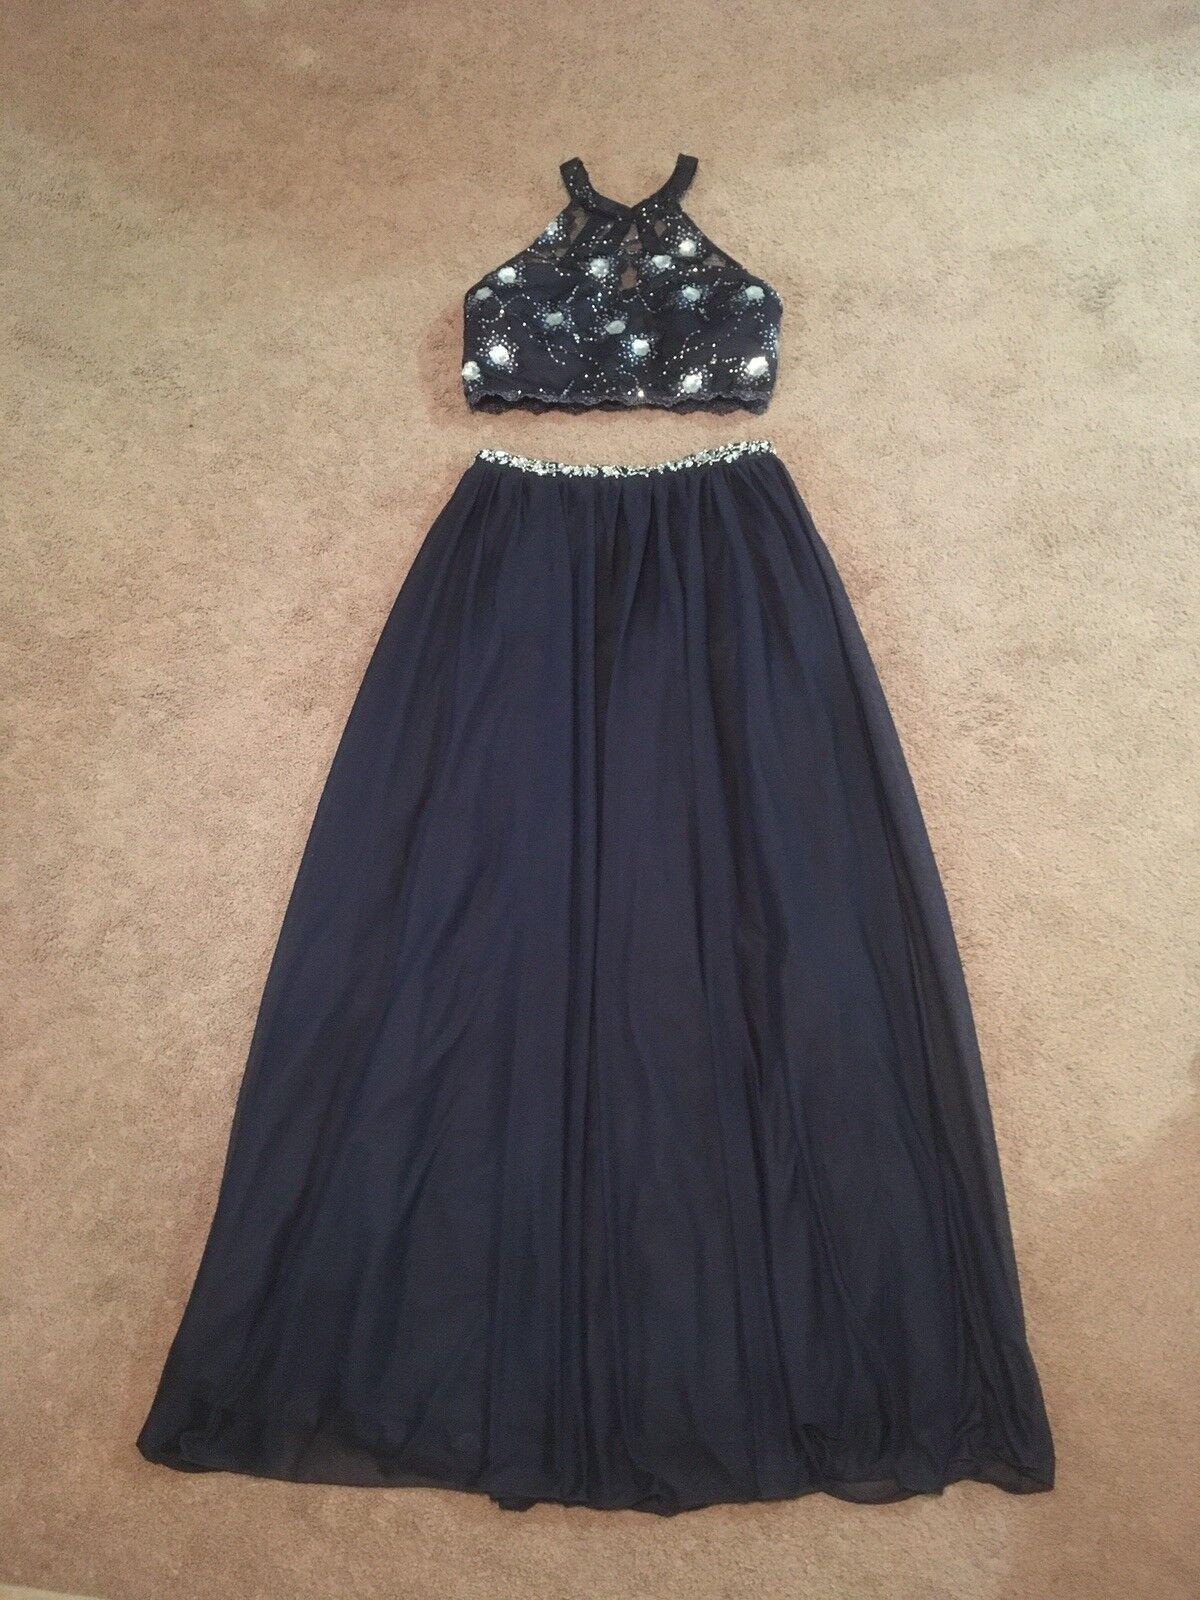 Women's Jr. Girls My Michelle Size 13 Navy bluee Prom Formal Homecoming Dress